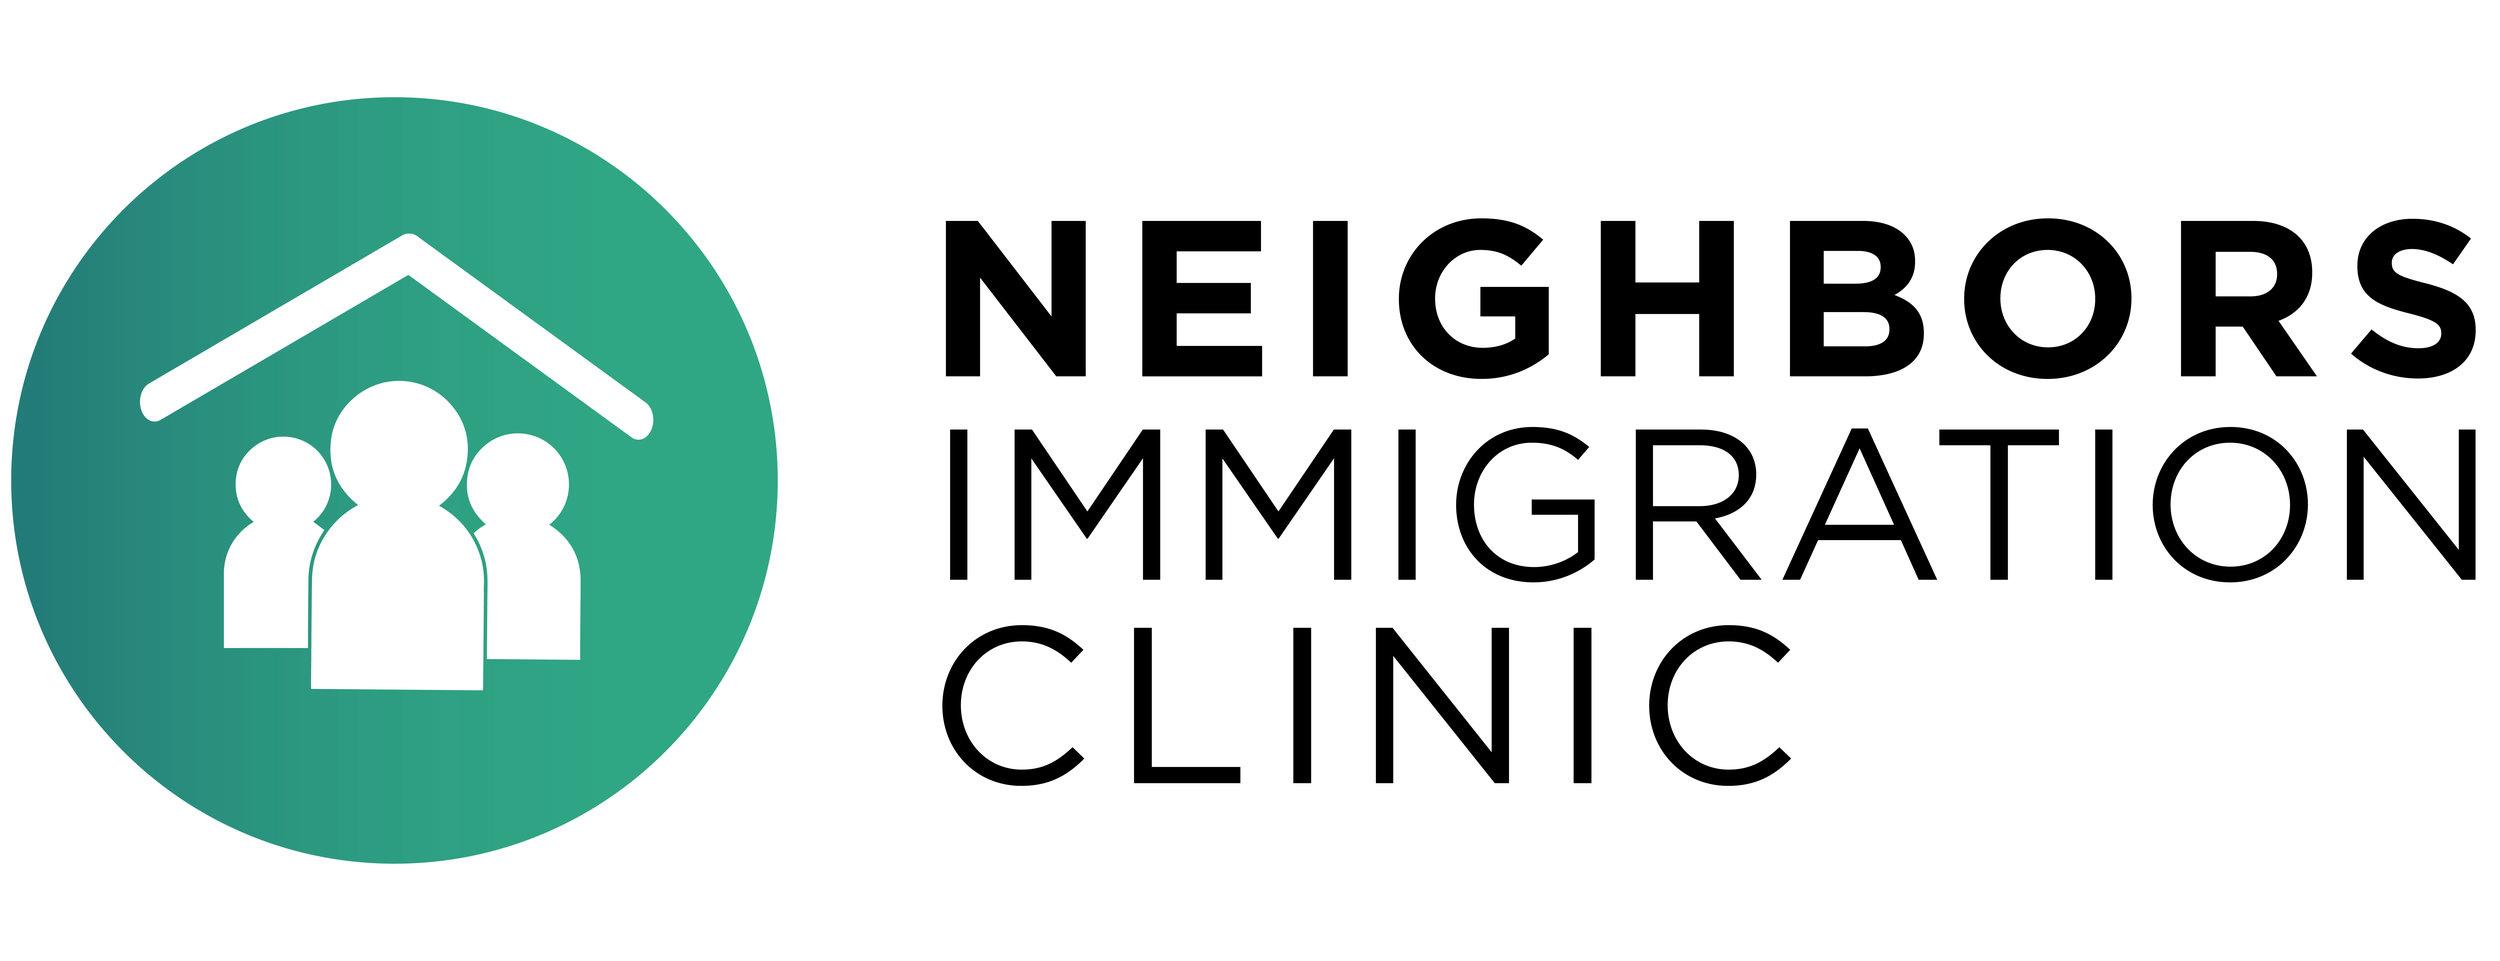 Neighbors Immigration Clinic Logos-09.jpg